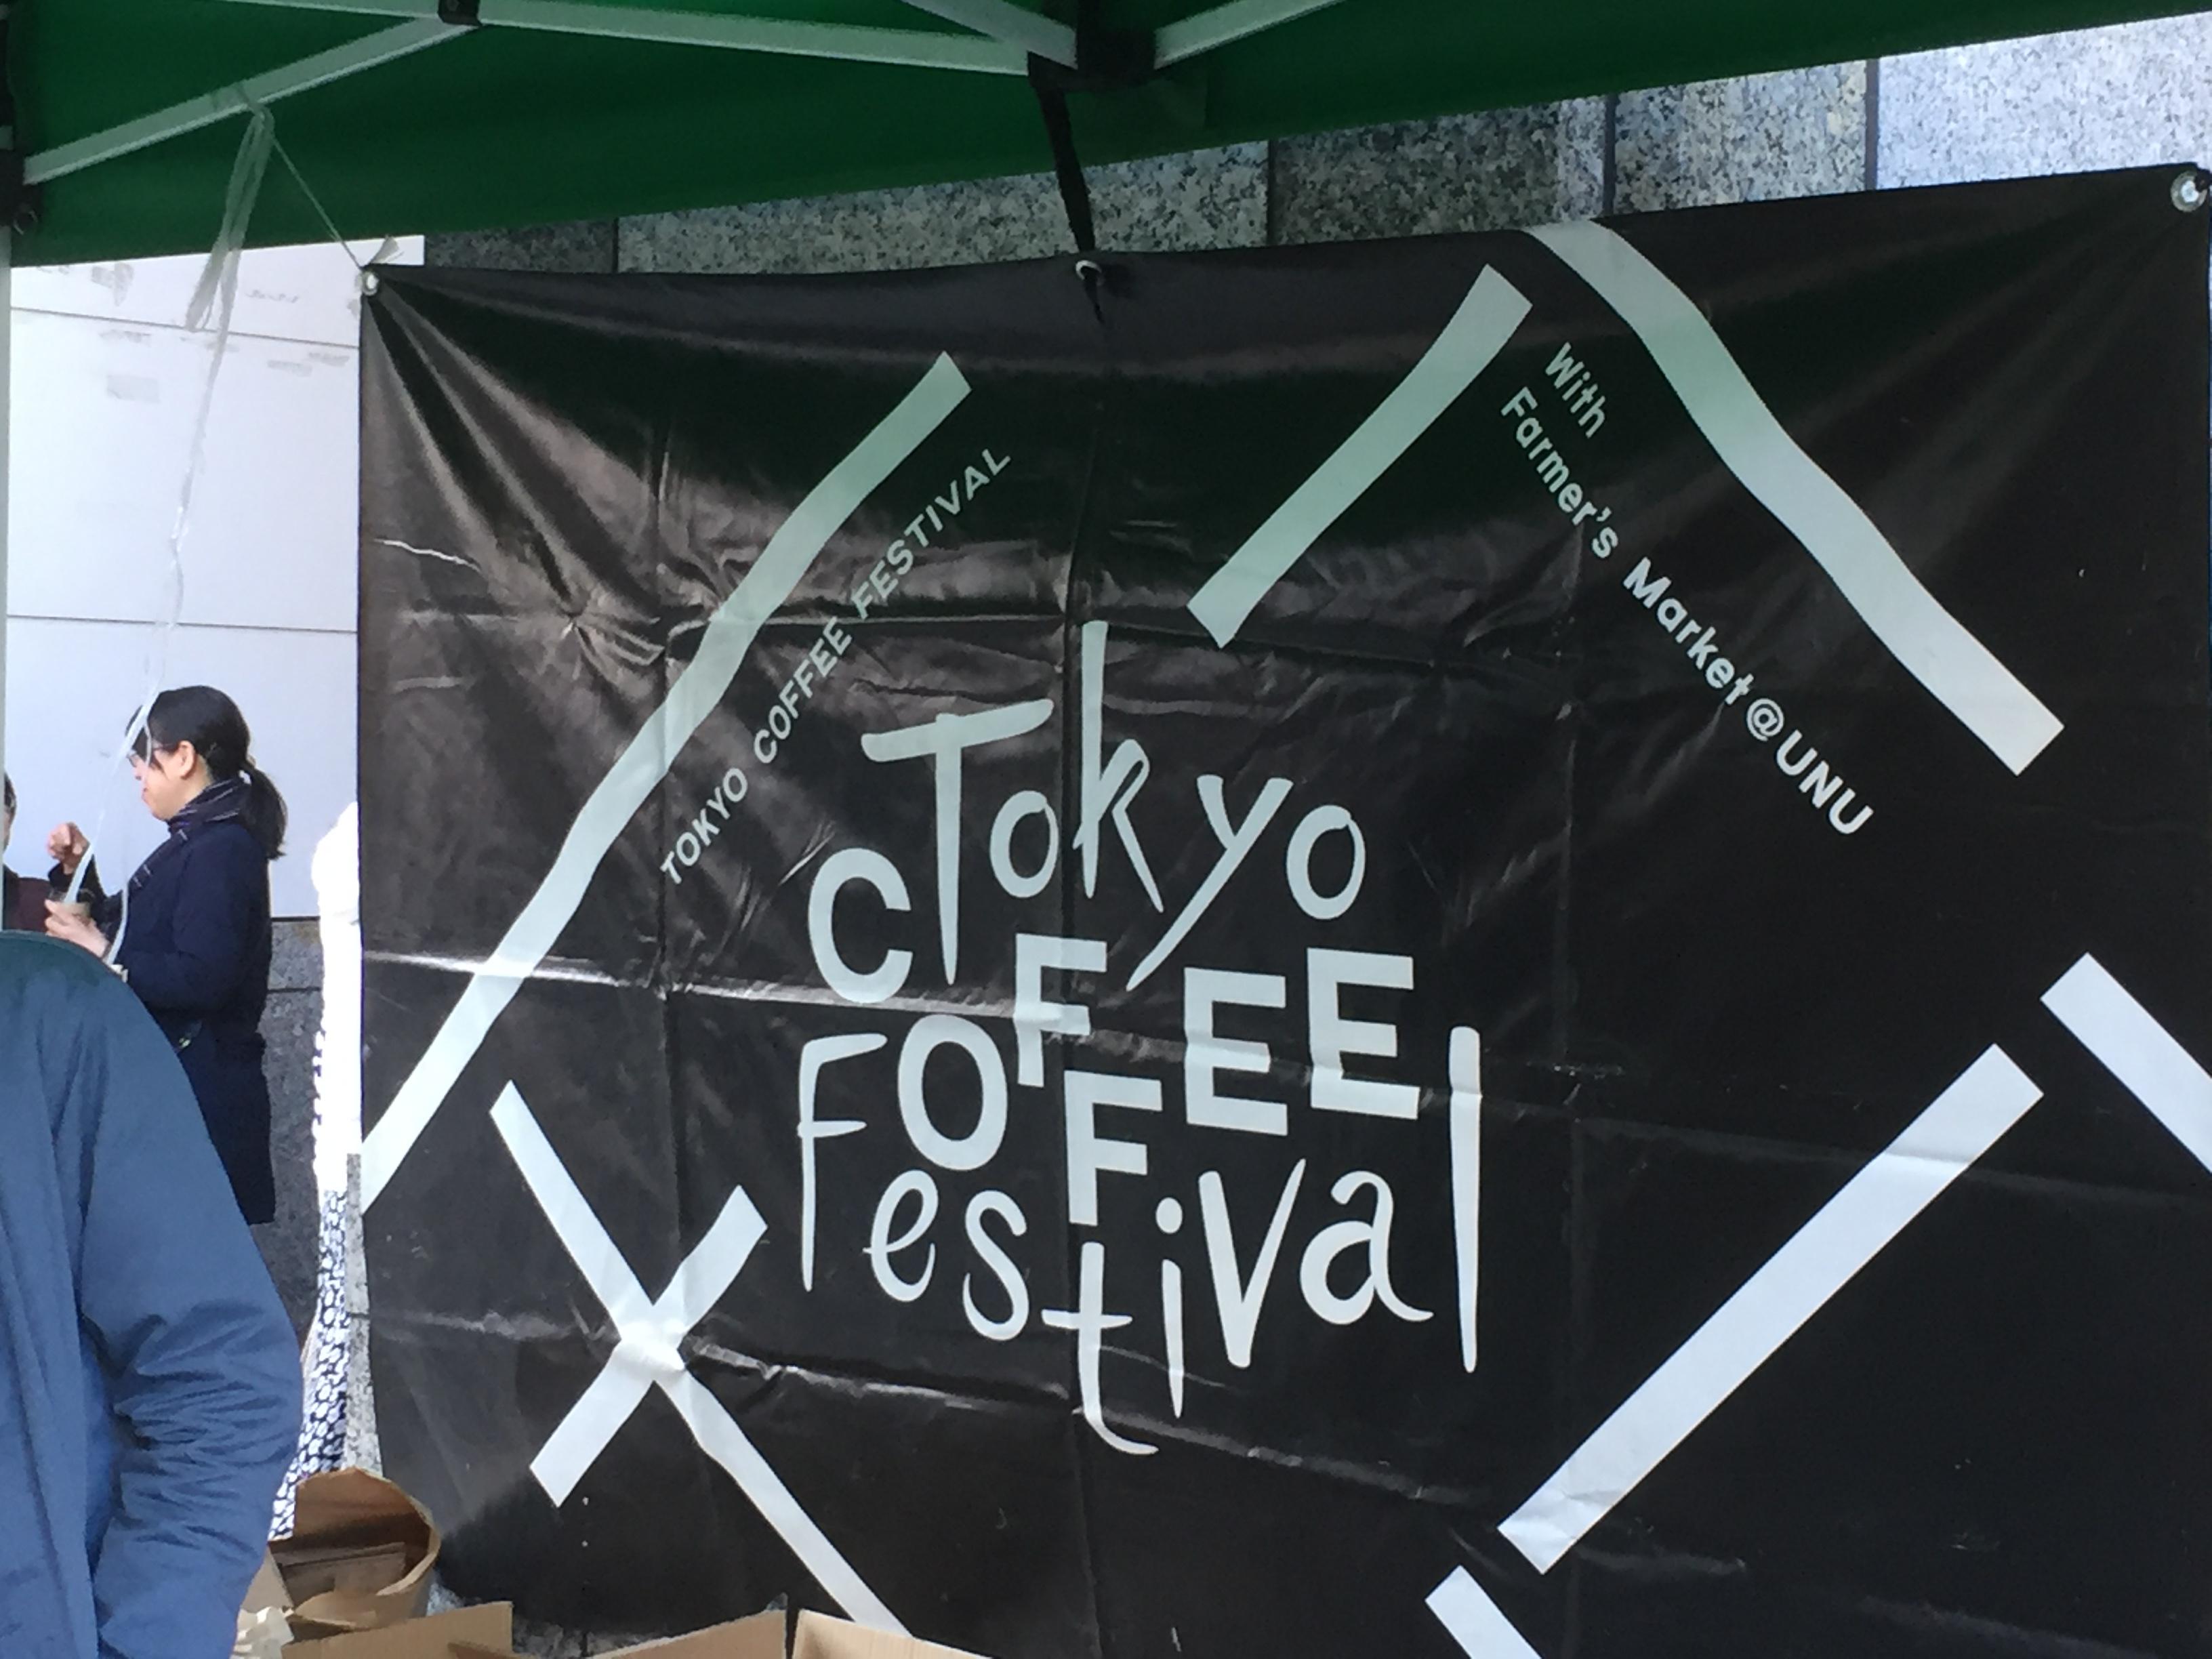 TOKYO COFFEE FESTIVAL(東京コーヒーフェスティバル) 2019 spring感想とレポート